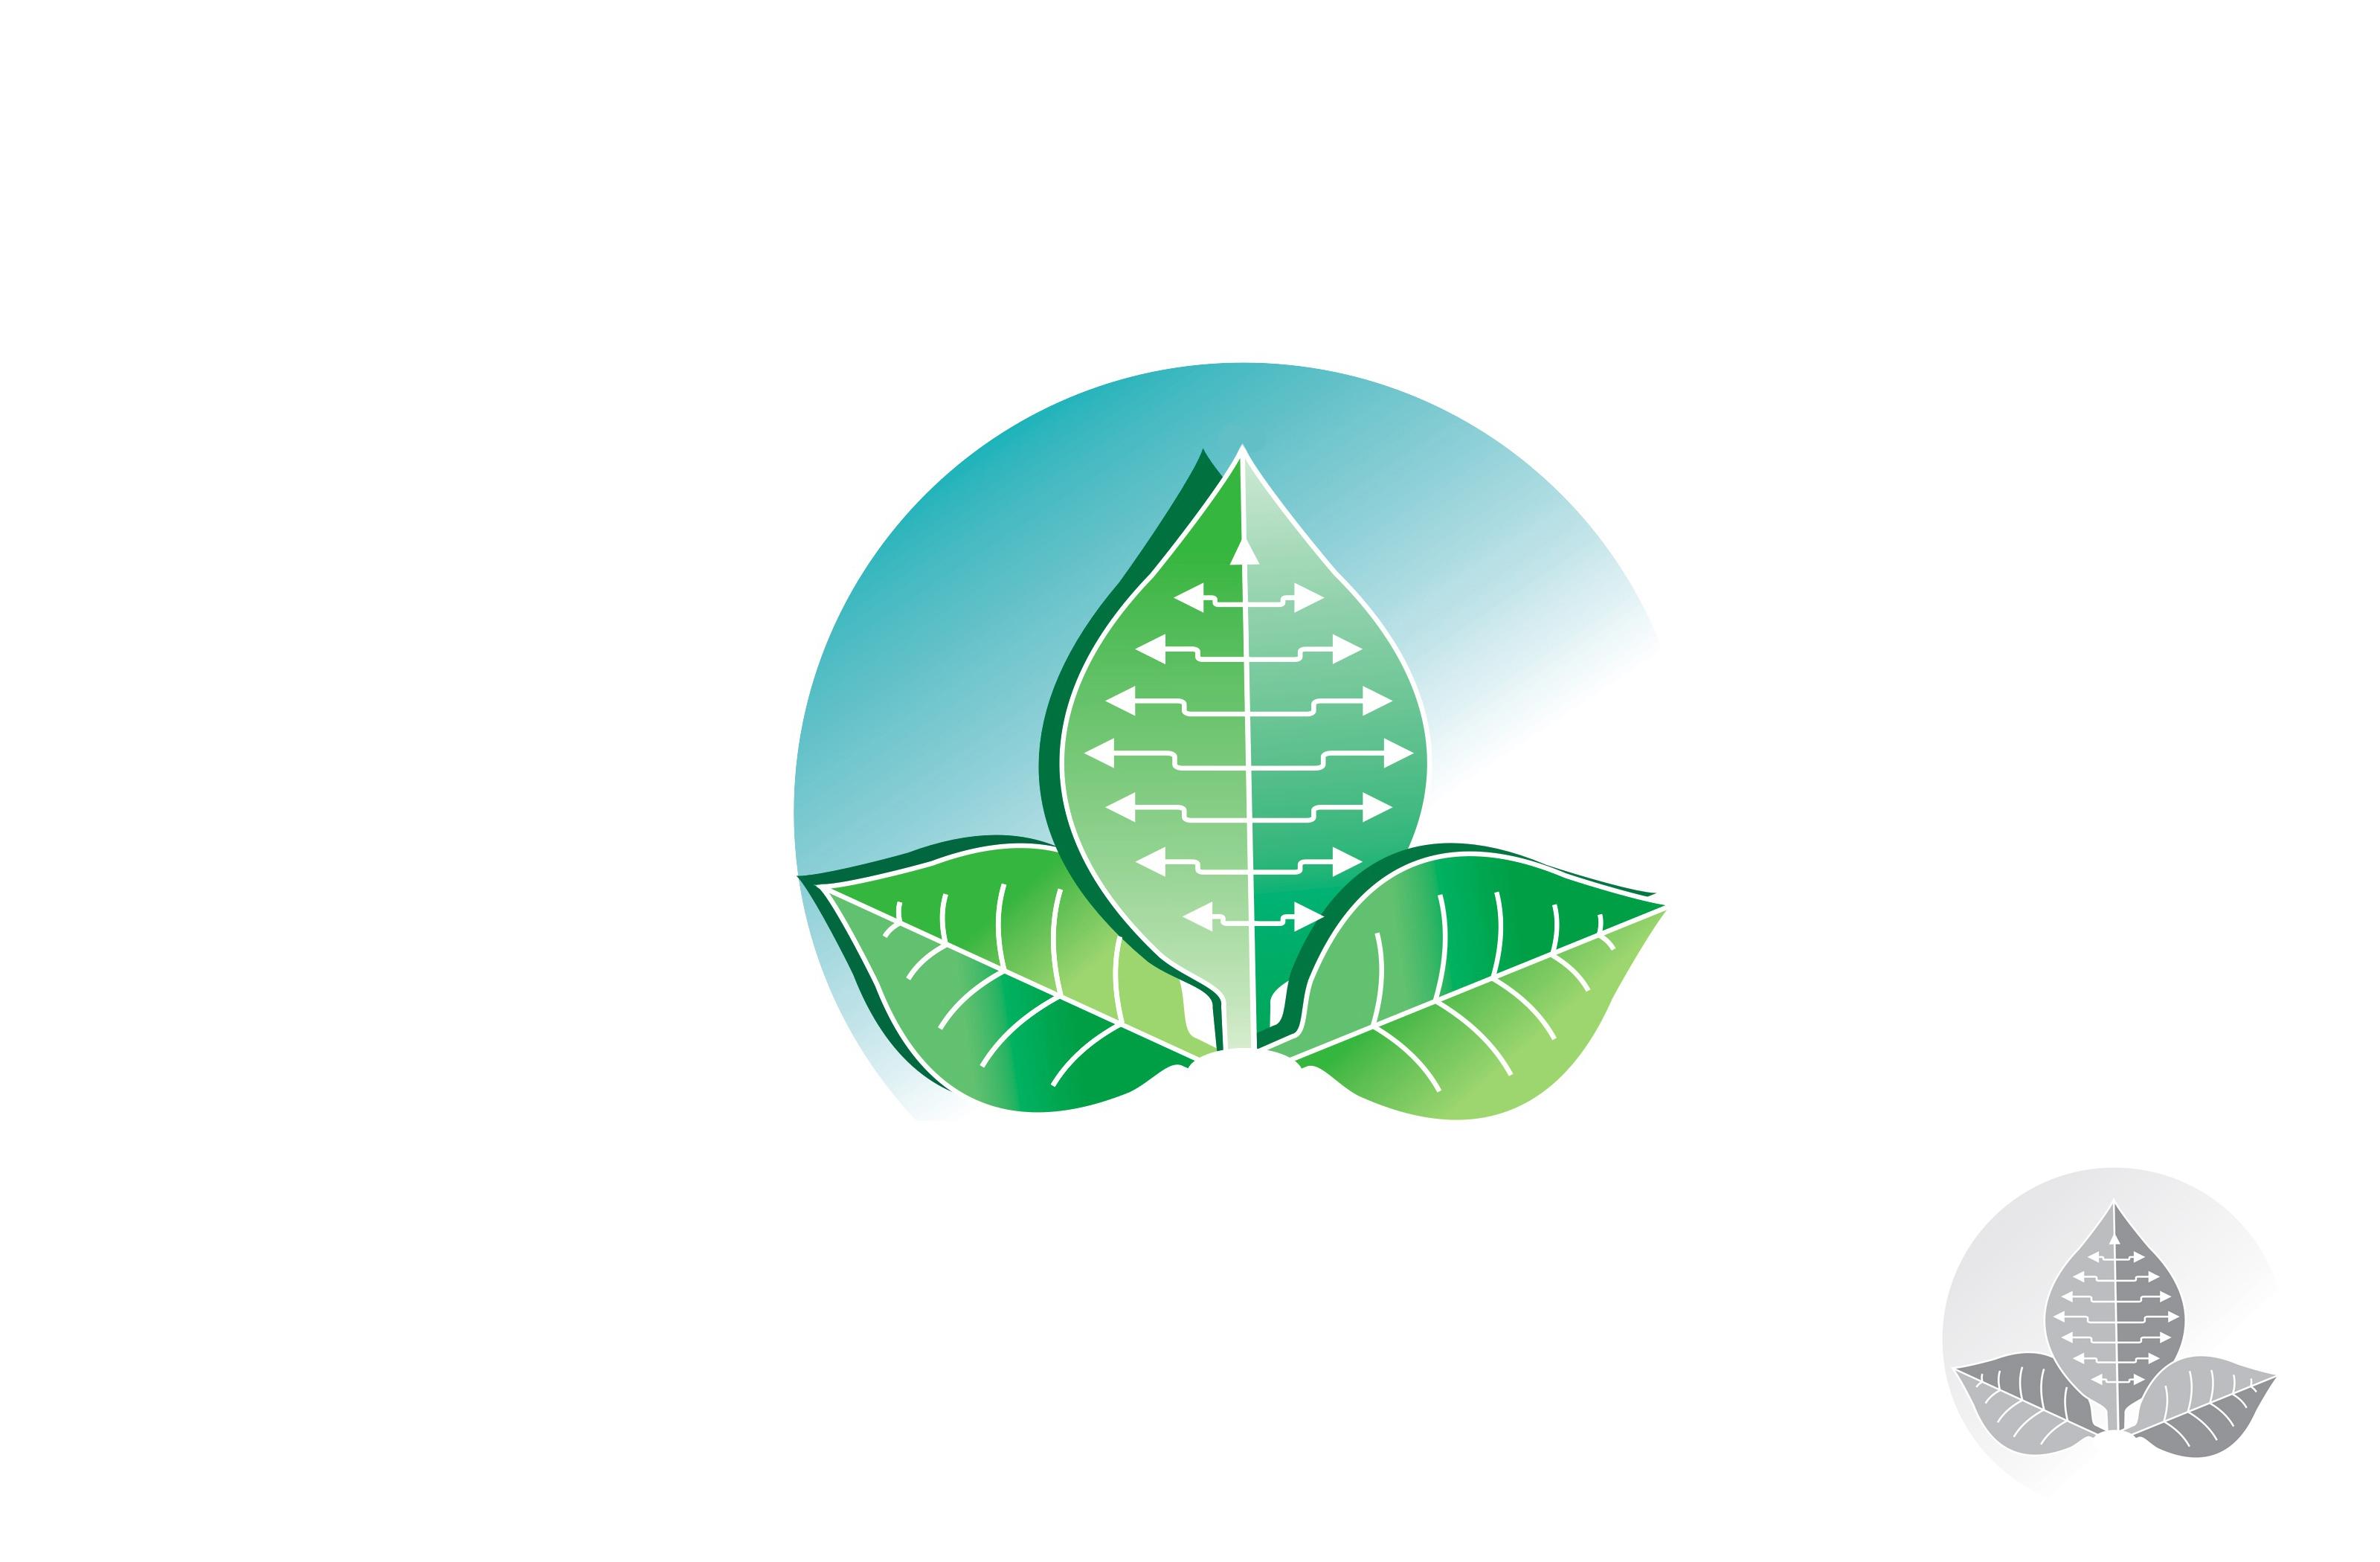 Logo Design by Kostas Vasiloglou - Entry No. 34 in the Logo Design Contest Artistic Logo Design for Louie Strategic Systems Consulting.